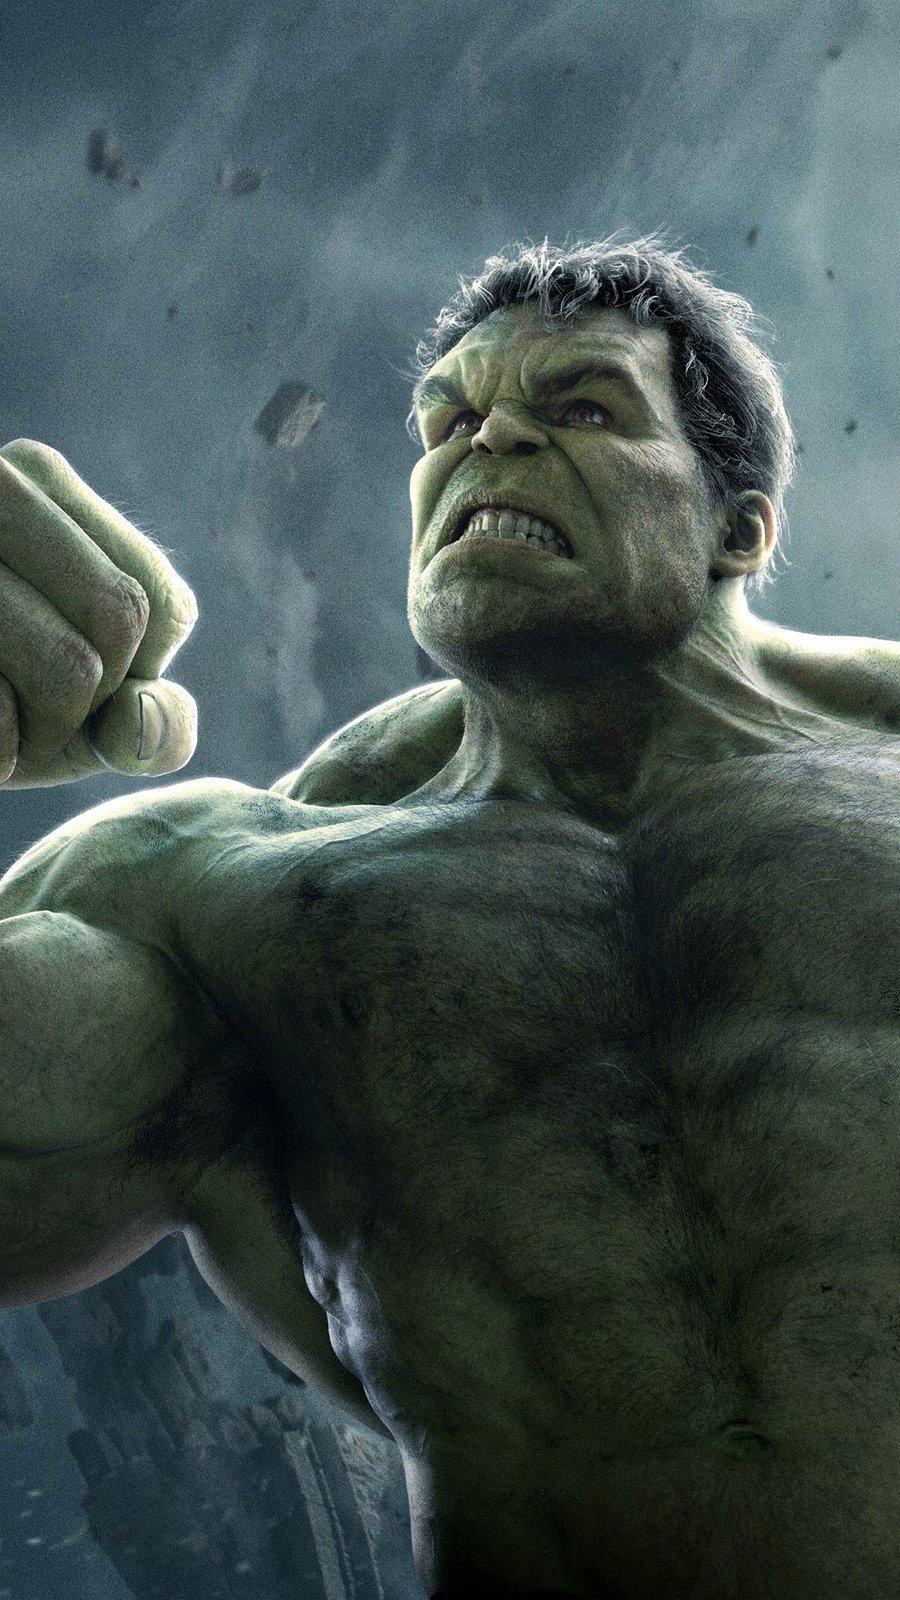 Fondos de pantalla Hulk en Avengers Age of Ultron Vertical